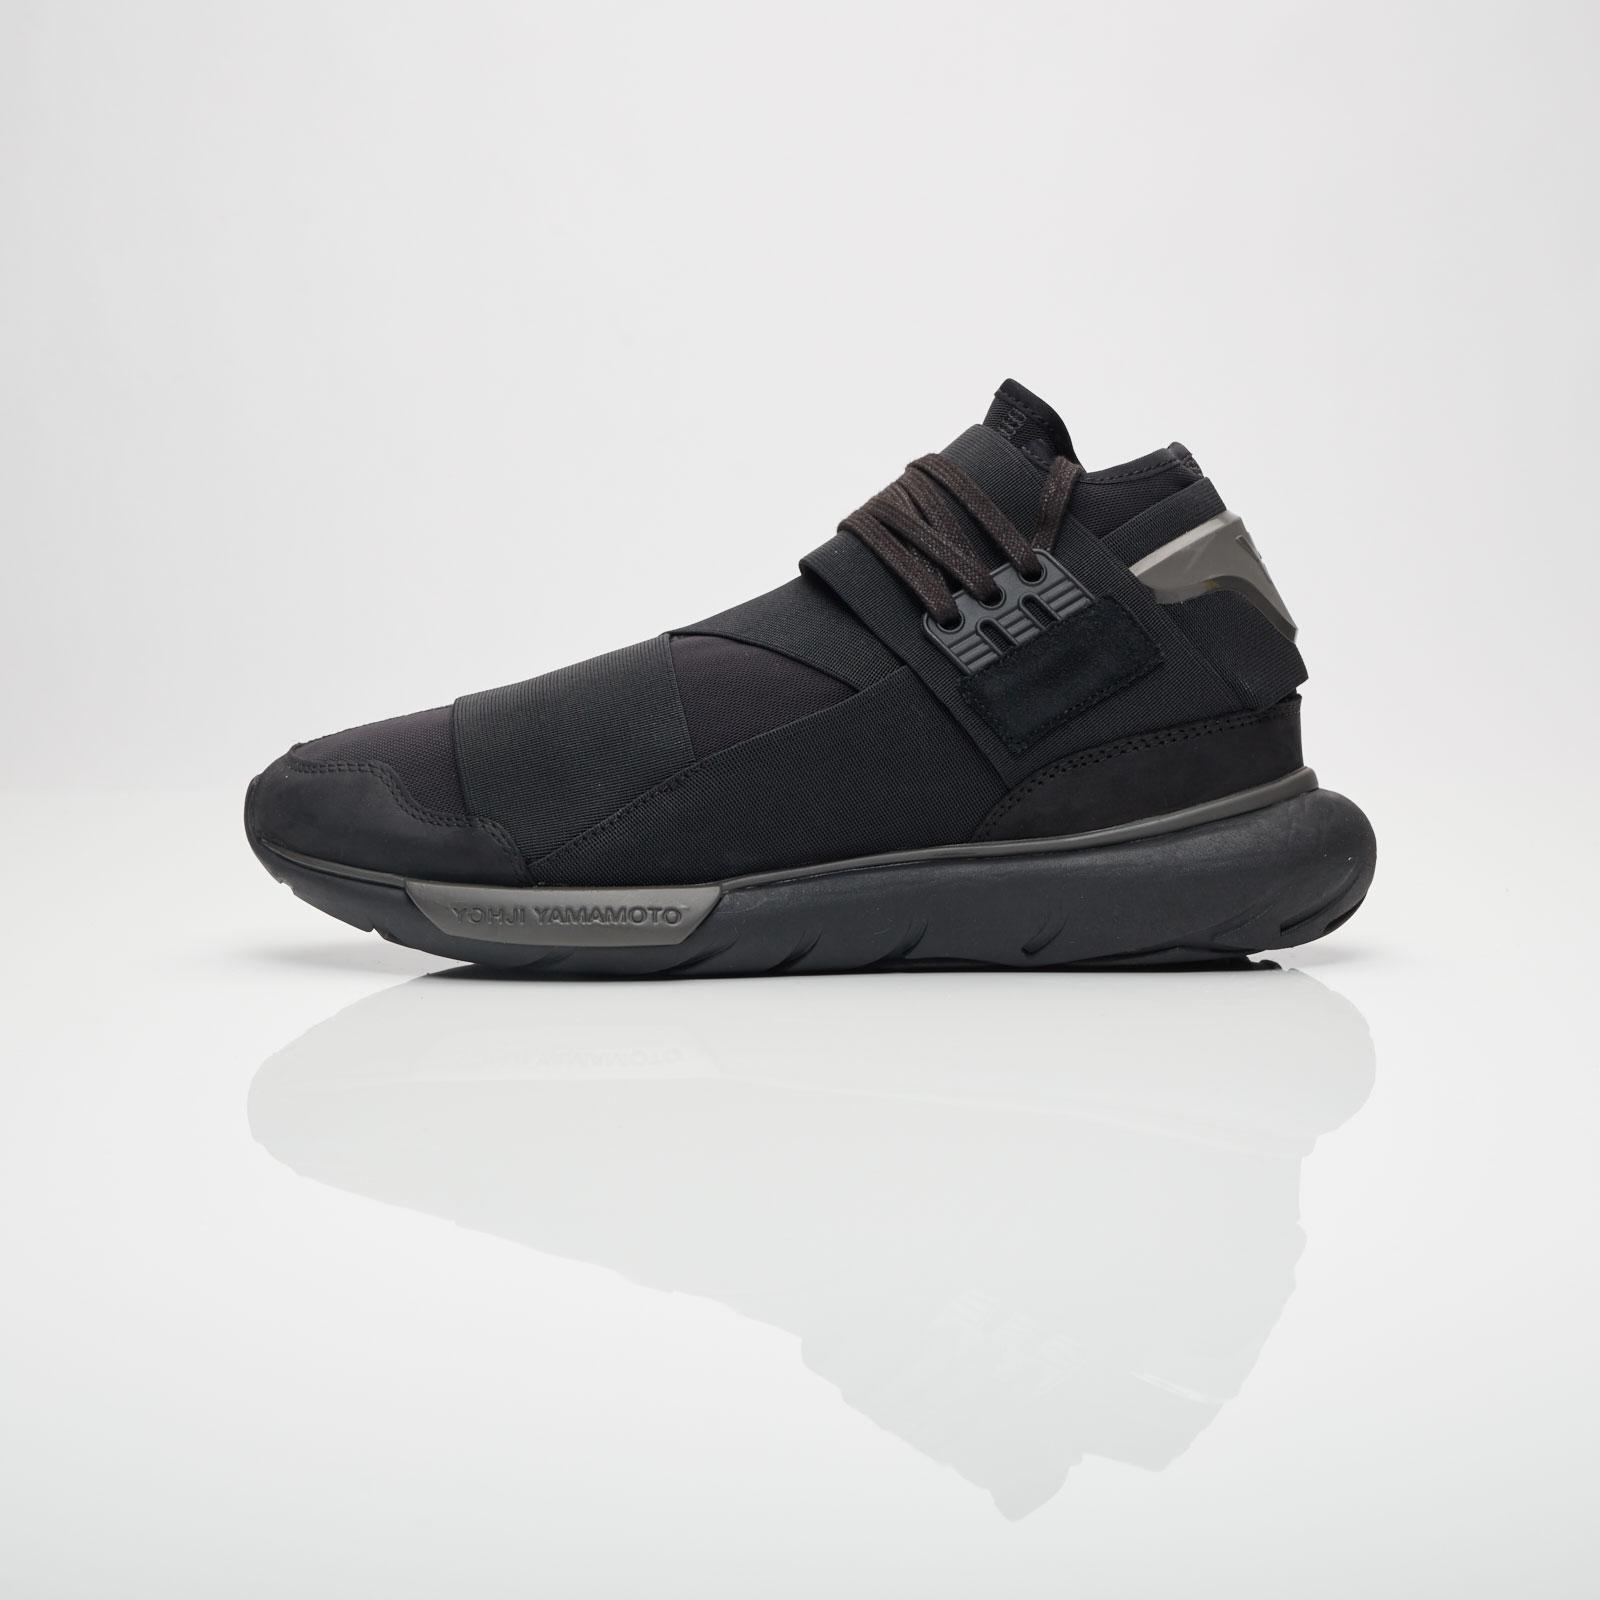 109d5efe4 adidas Qasa High - Cp9854 - Sneakersnstuff